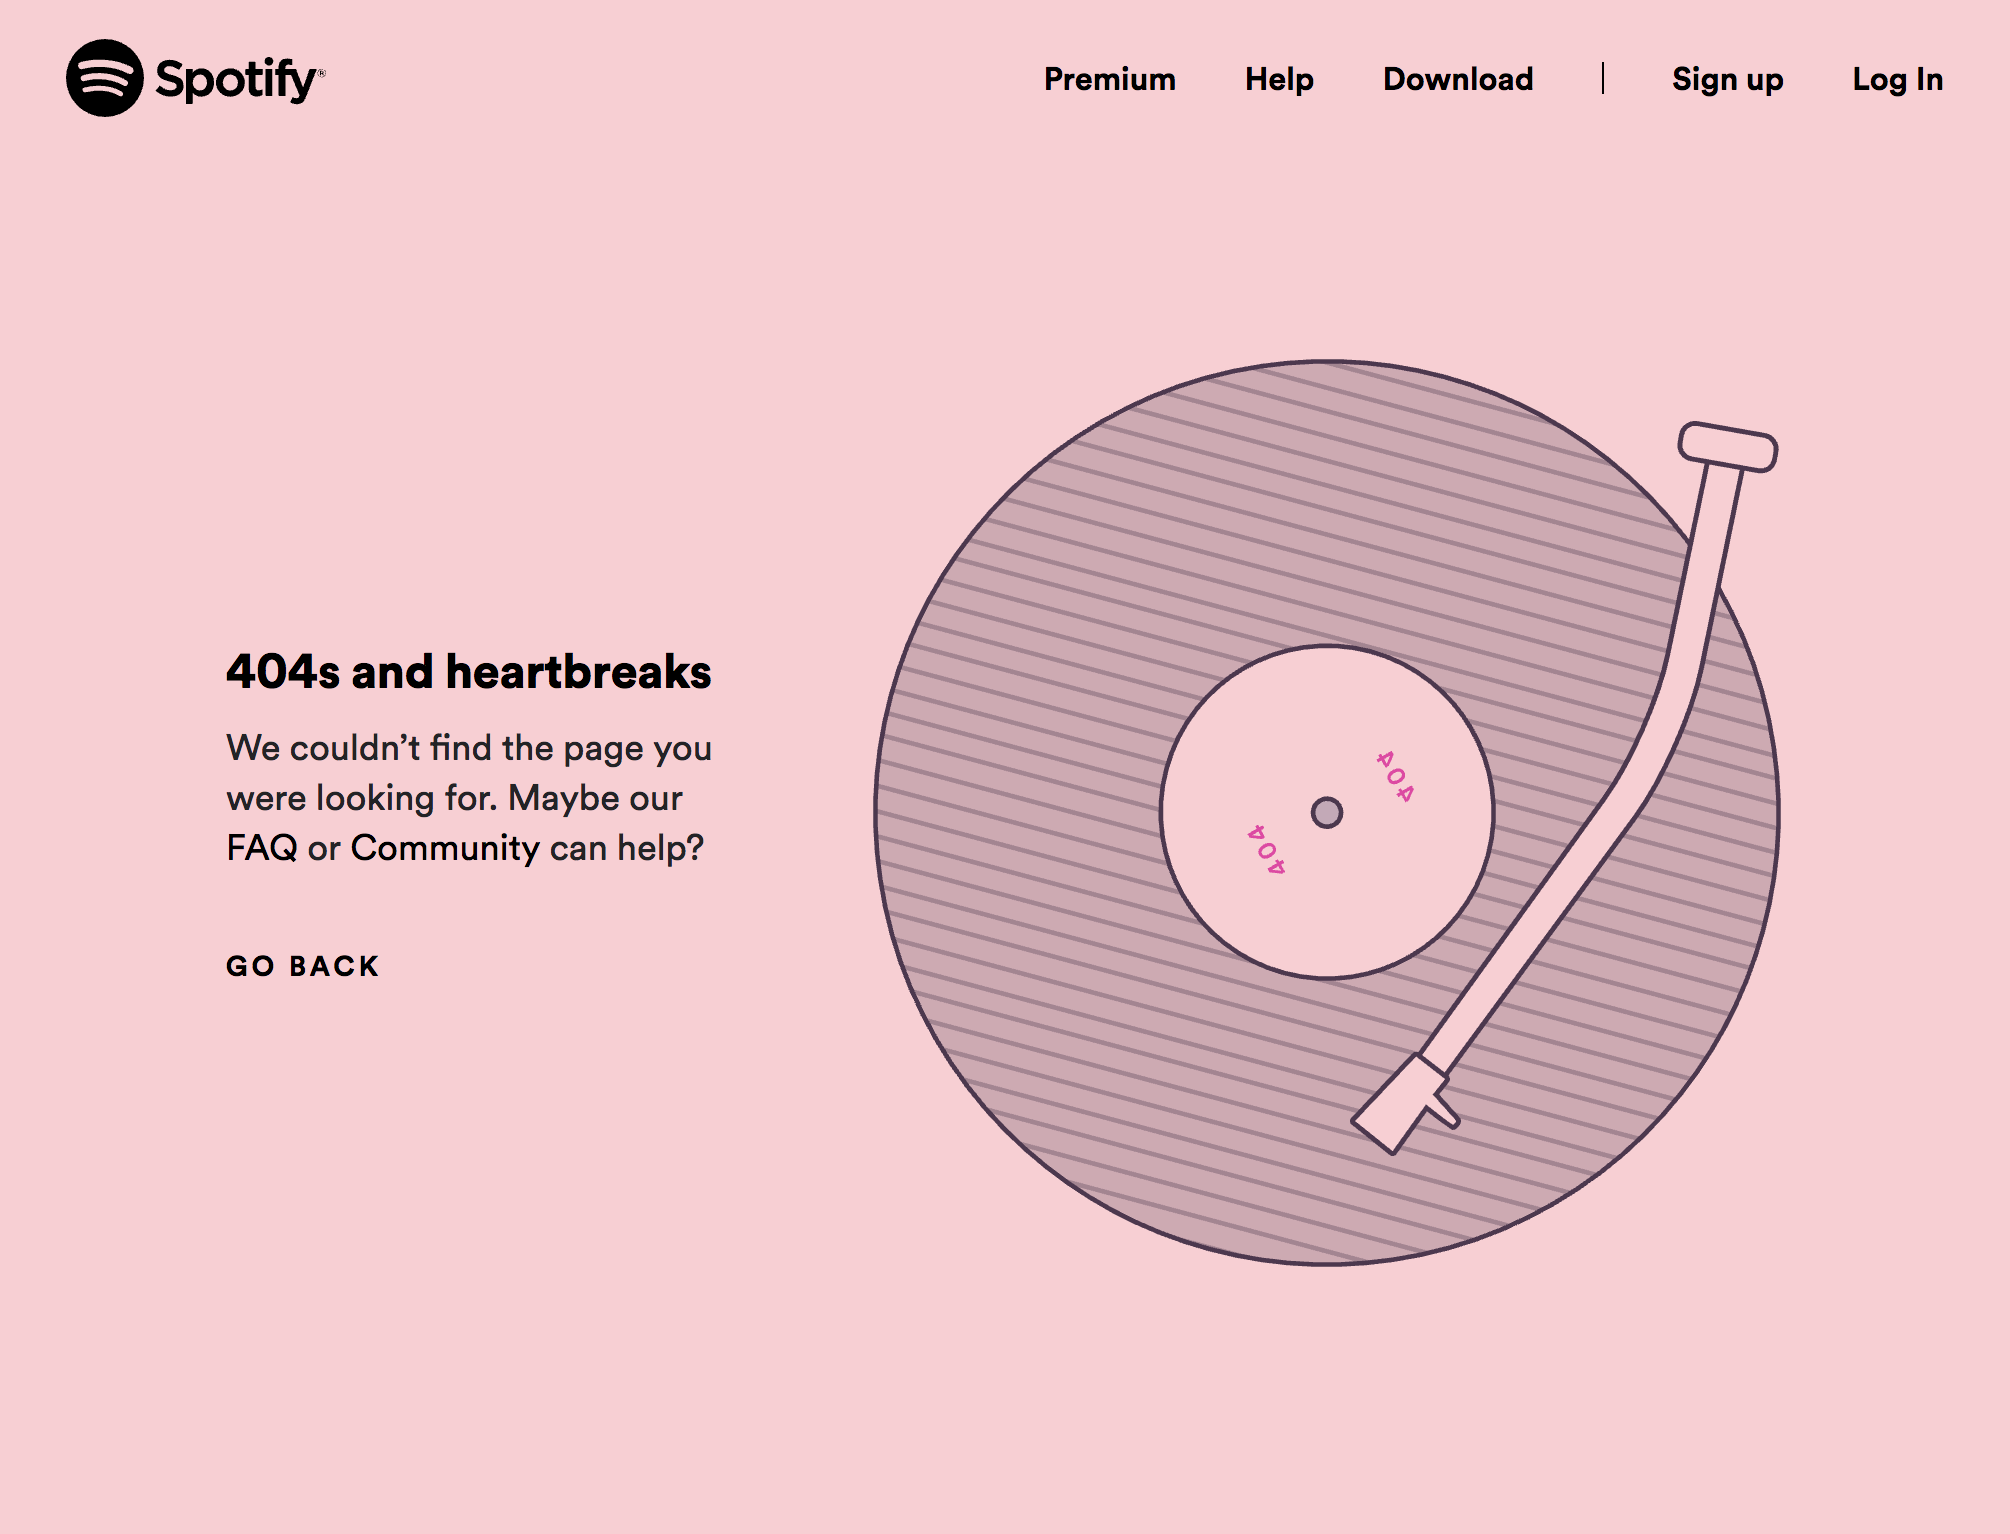 Spotify 404 error page